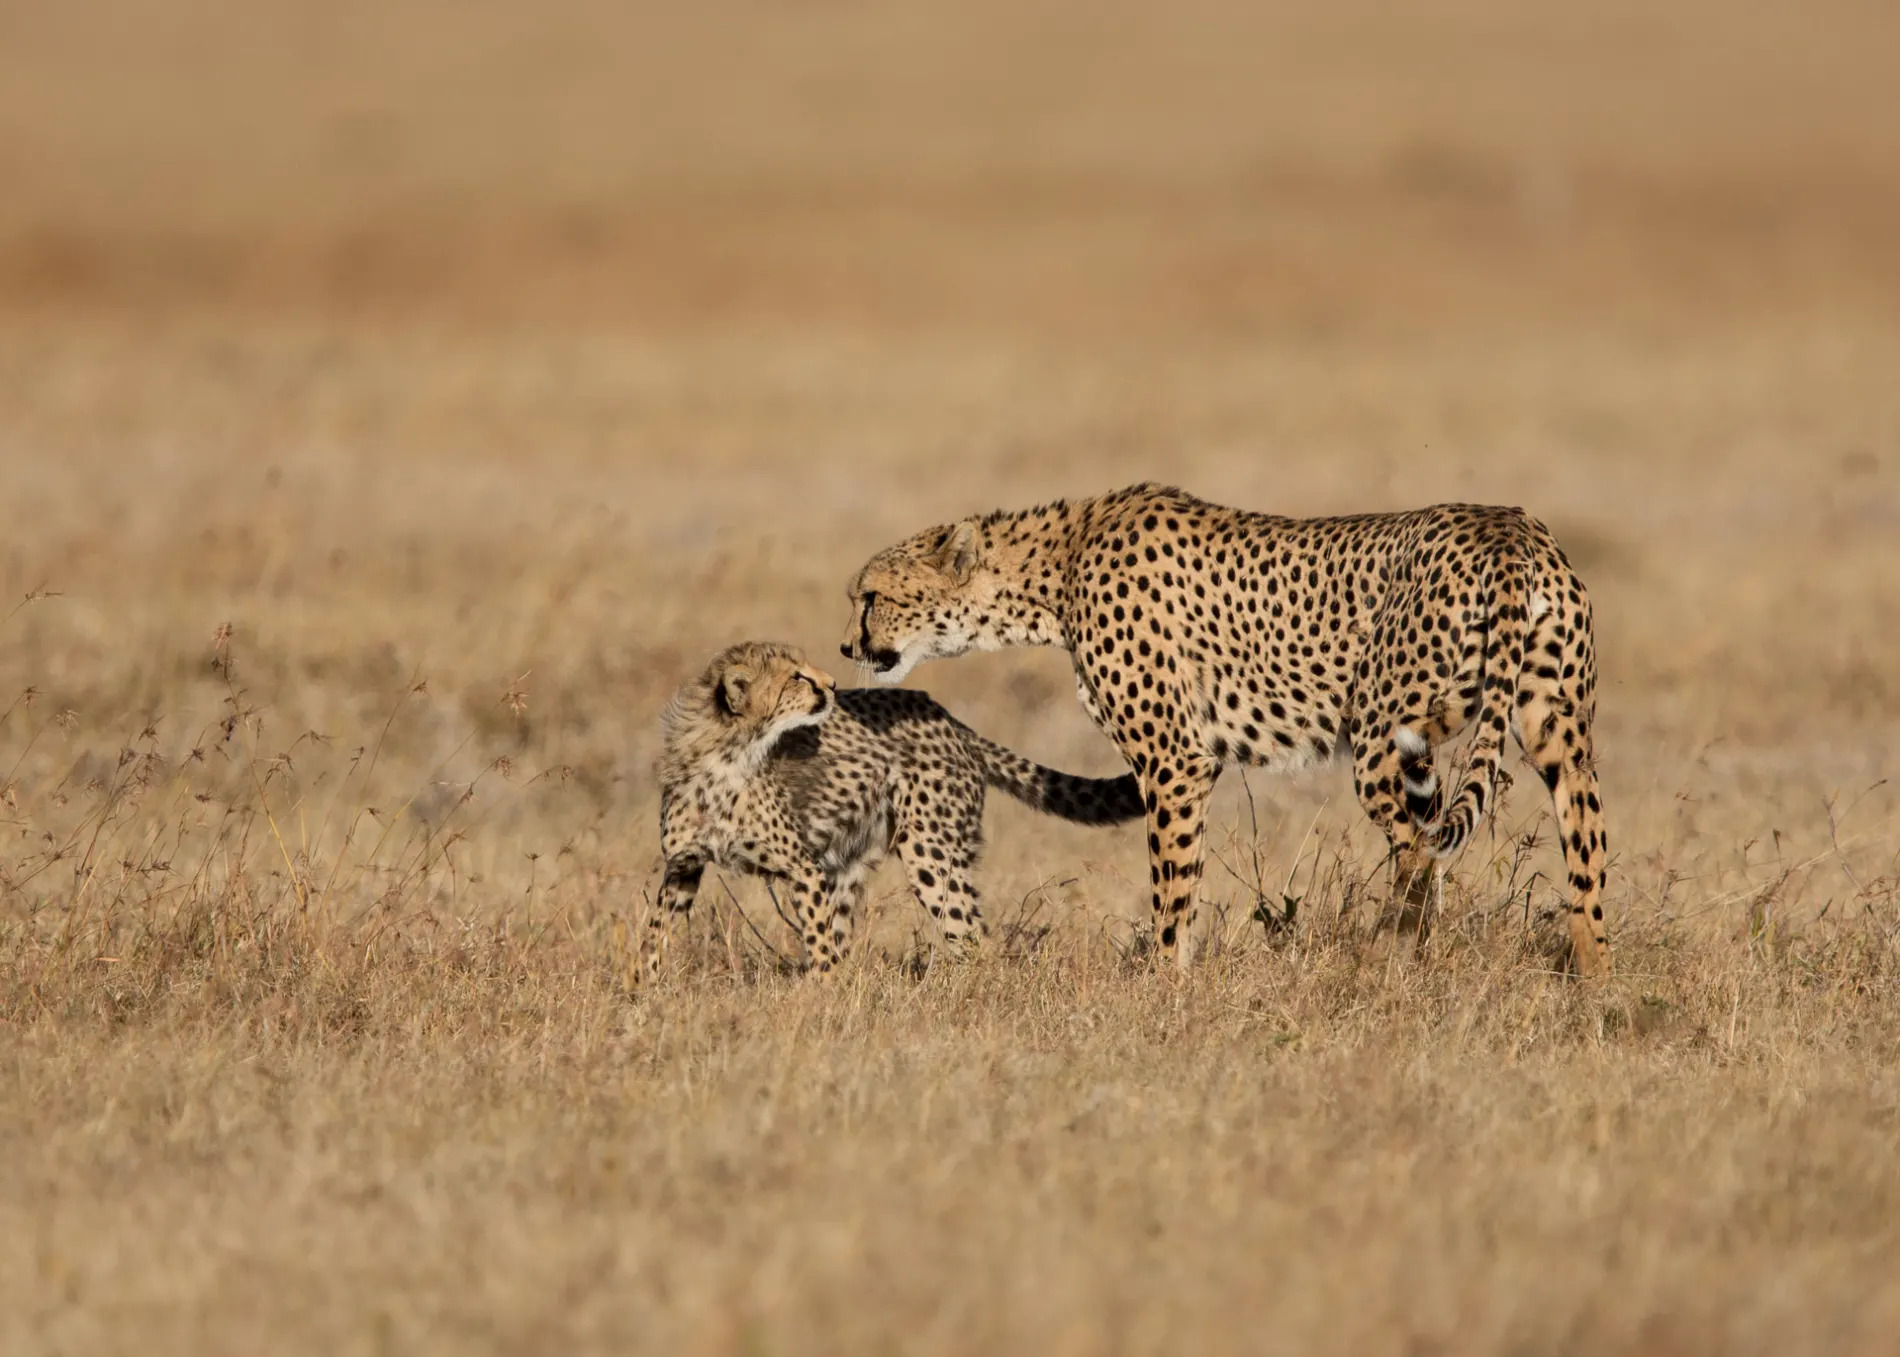 Pejeta cheetah